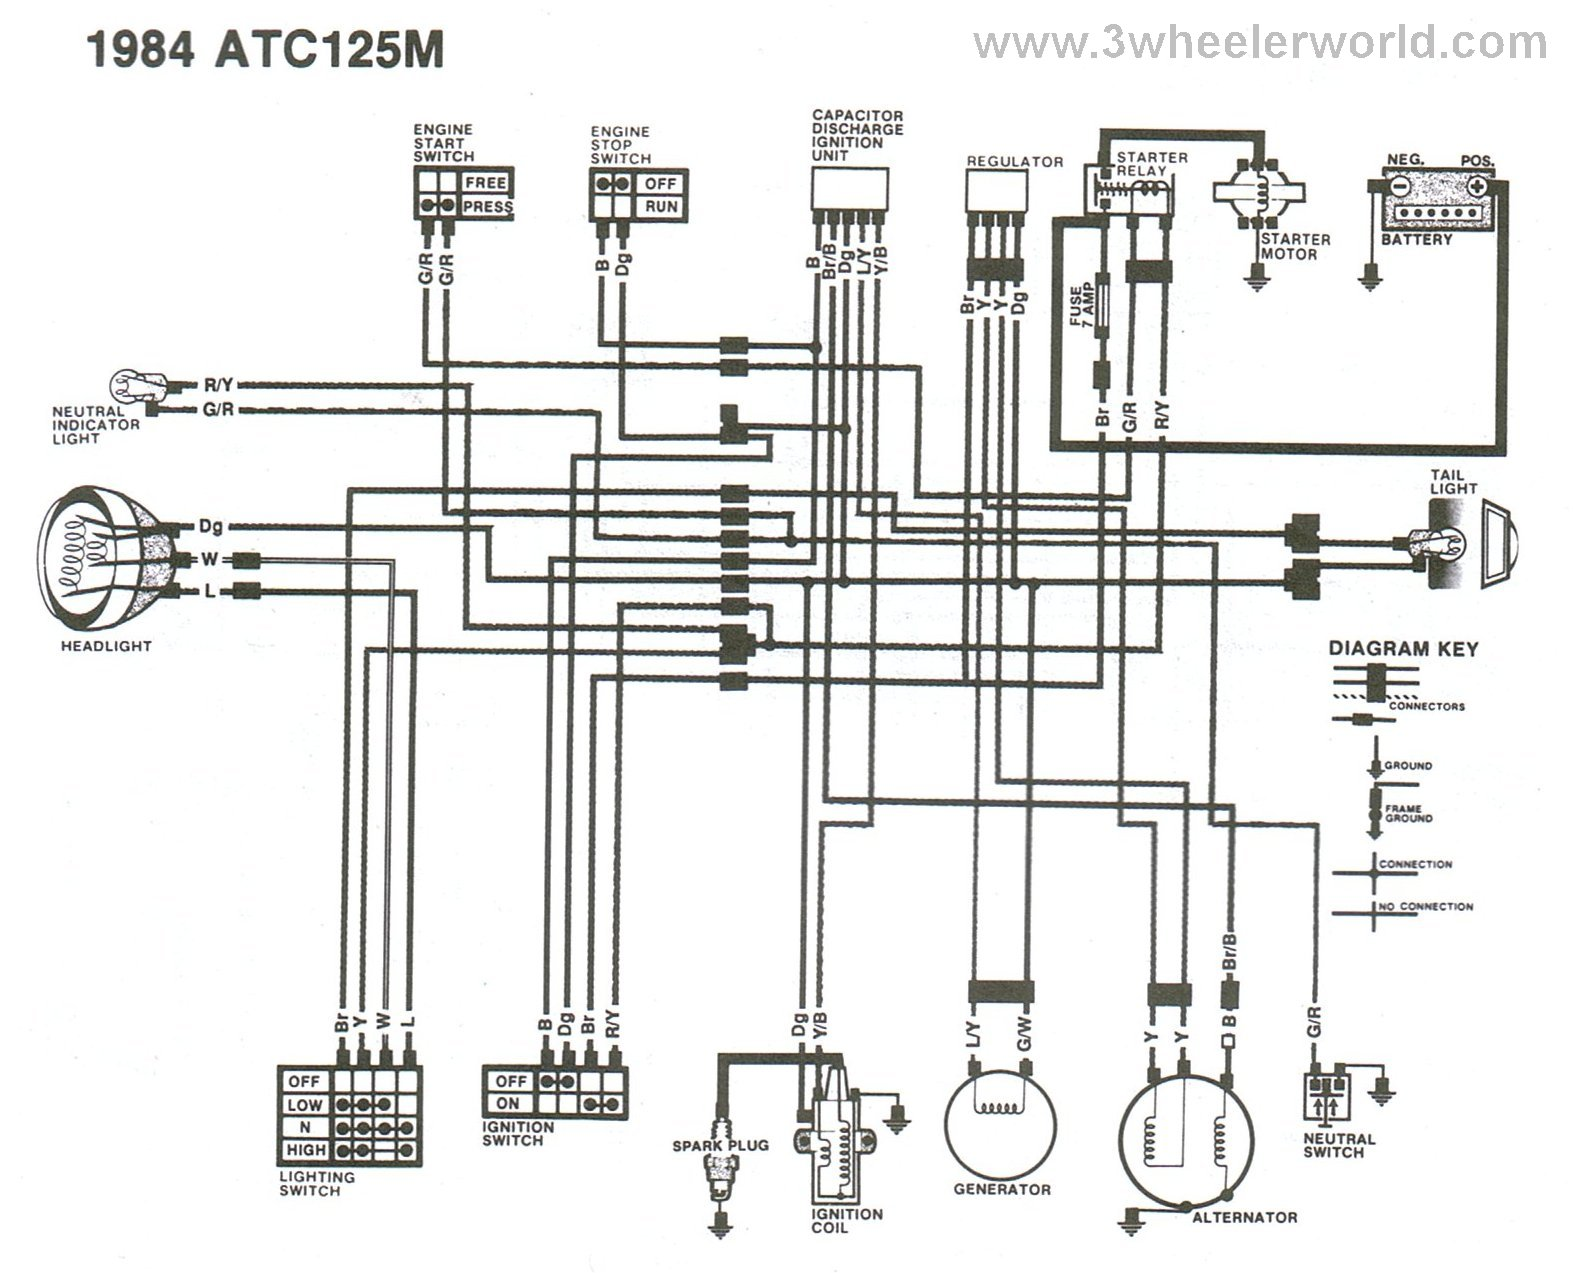 Appealing 2003 Honda Shadow Ace 750 Wiring Diagram Images - Best ...